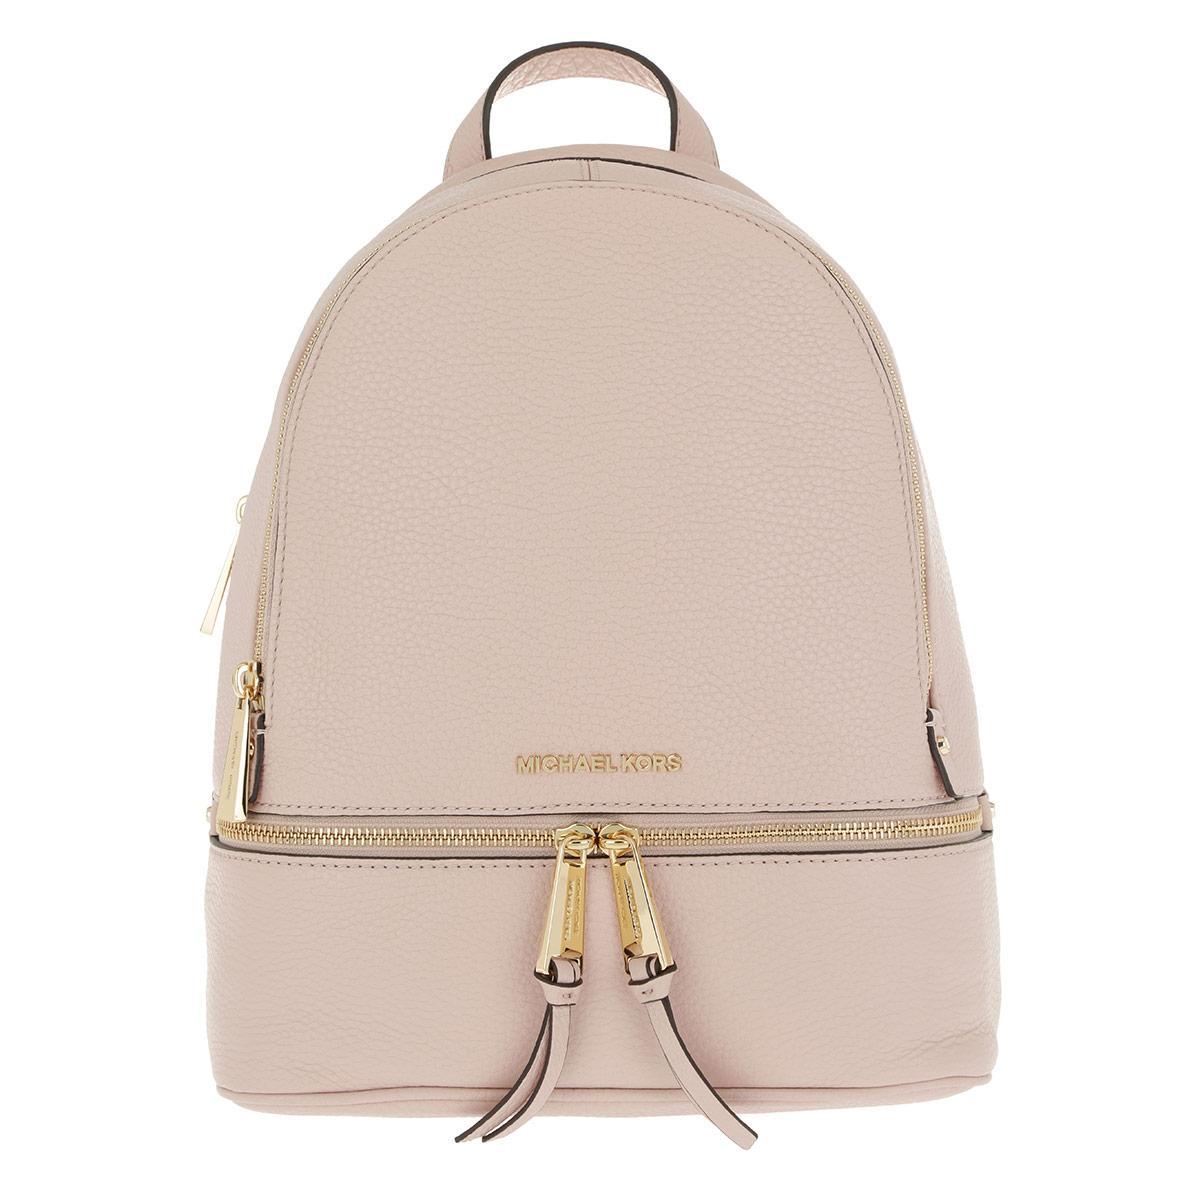 4f14d70a6d6d9 Michael Kors - Rhea Zip Medium Backpack Soft Pink - Lyst. View fullscreen